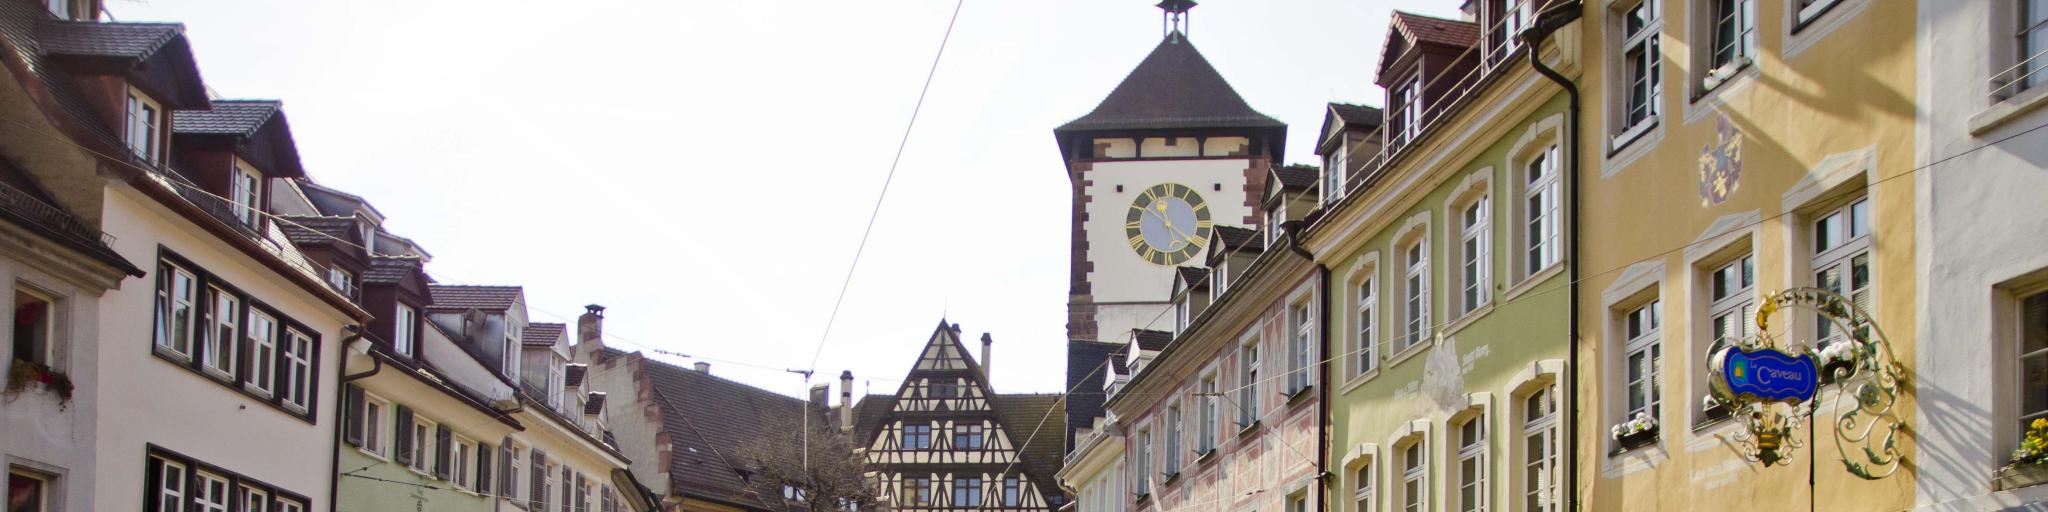 Street in Freiburg, Germany